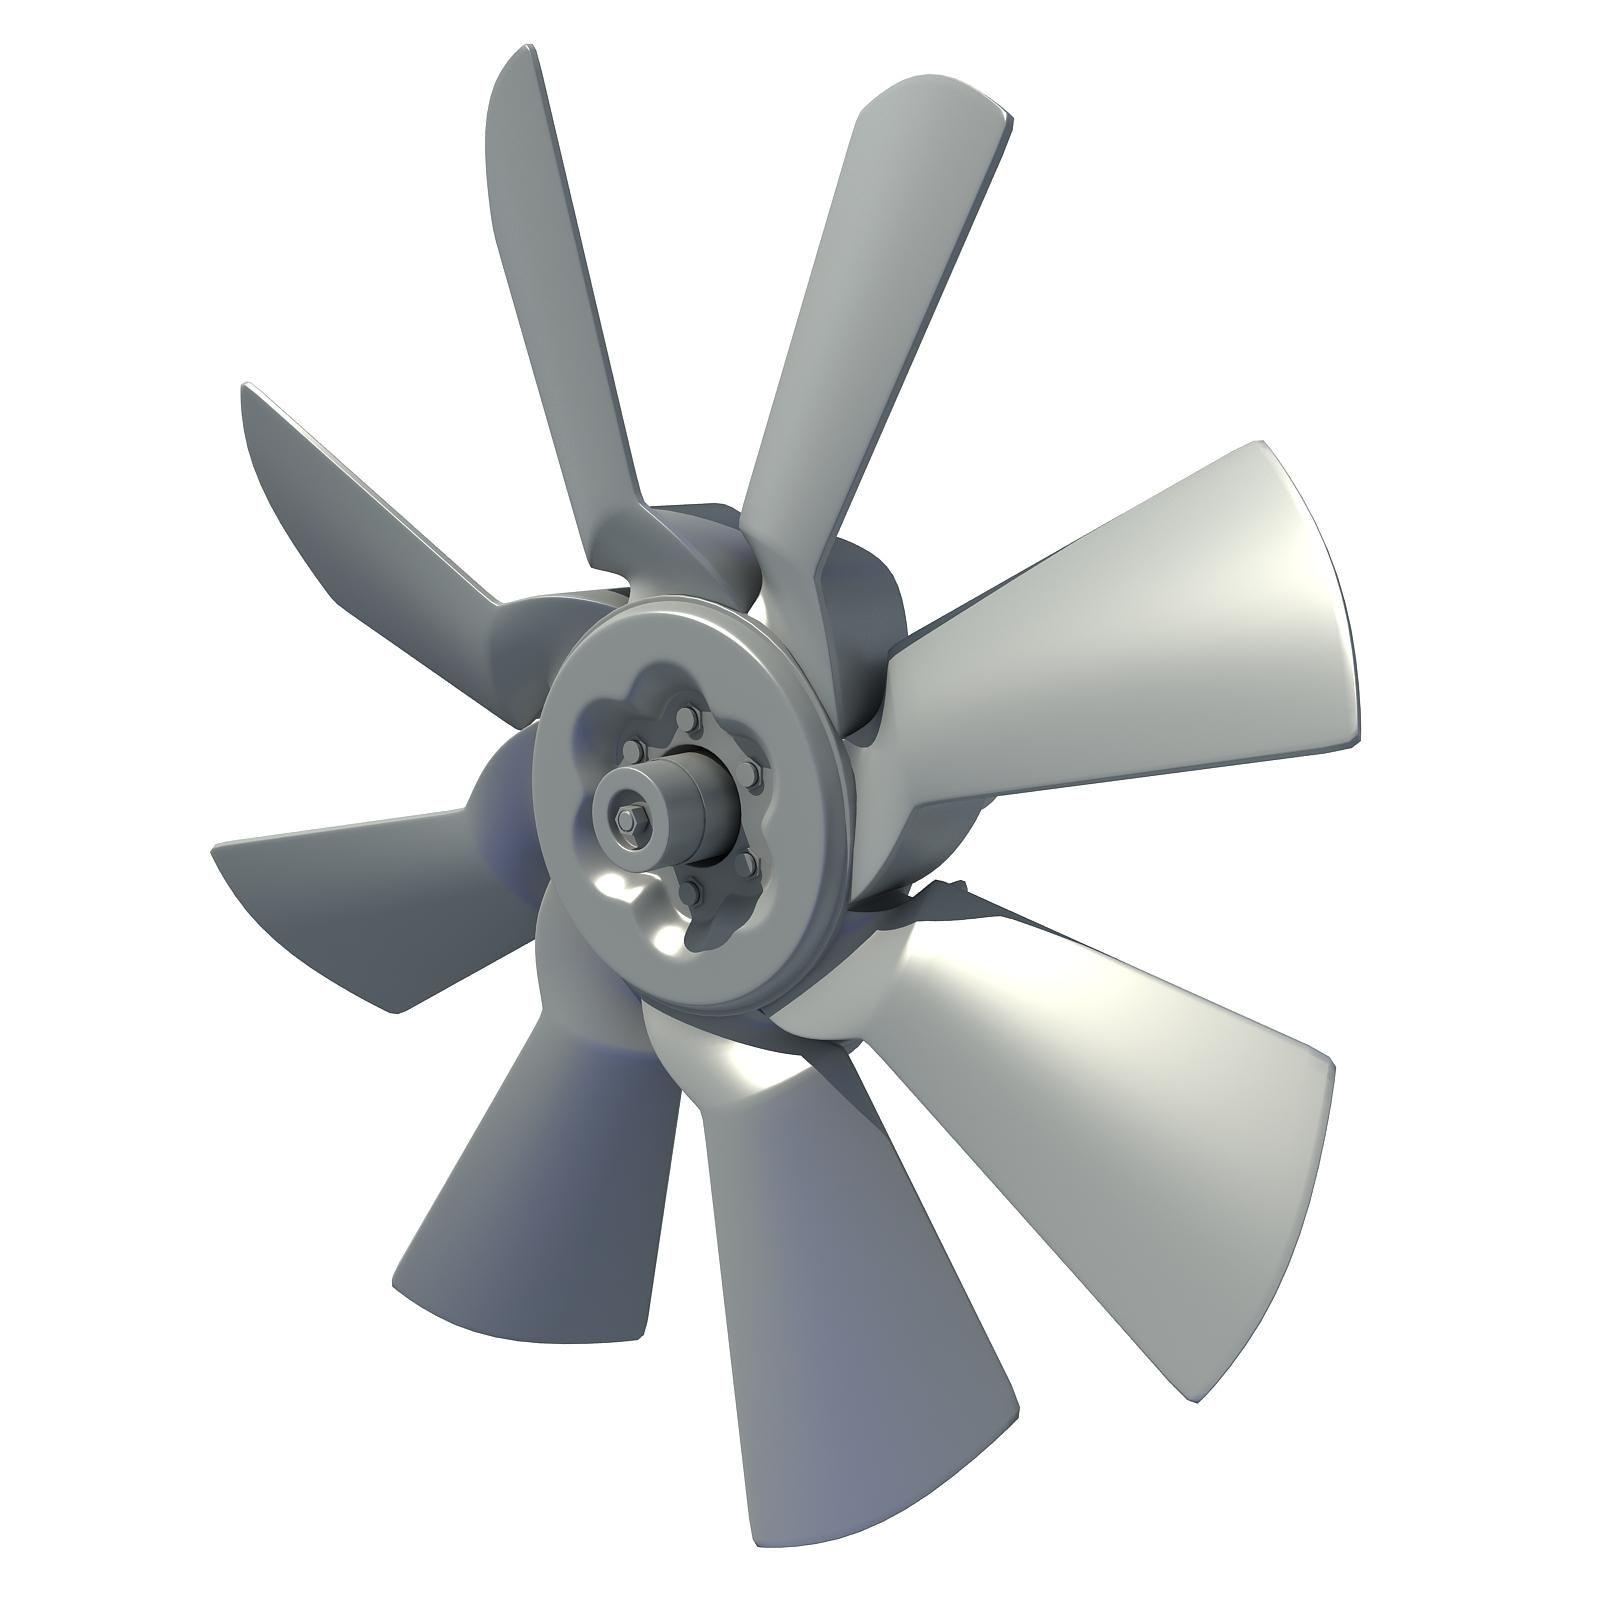 Engine Cooling Fan 3d Model Ad Cooling Engine Model Fan